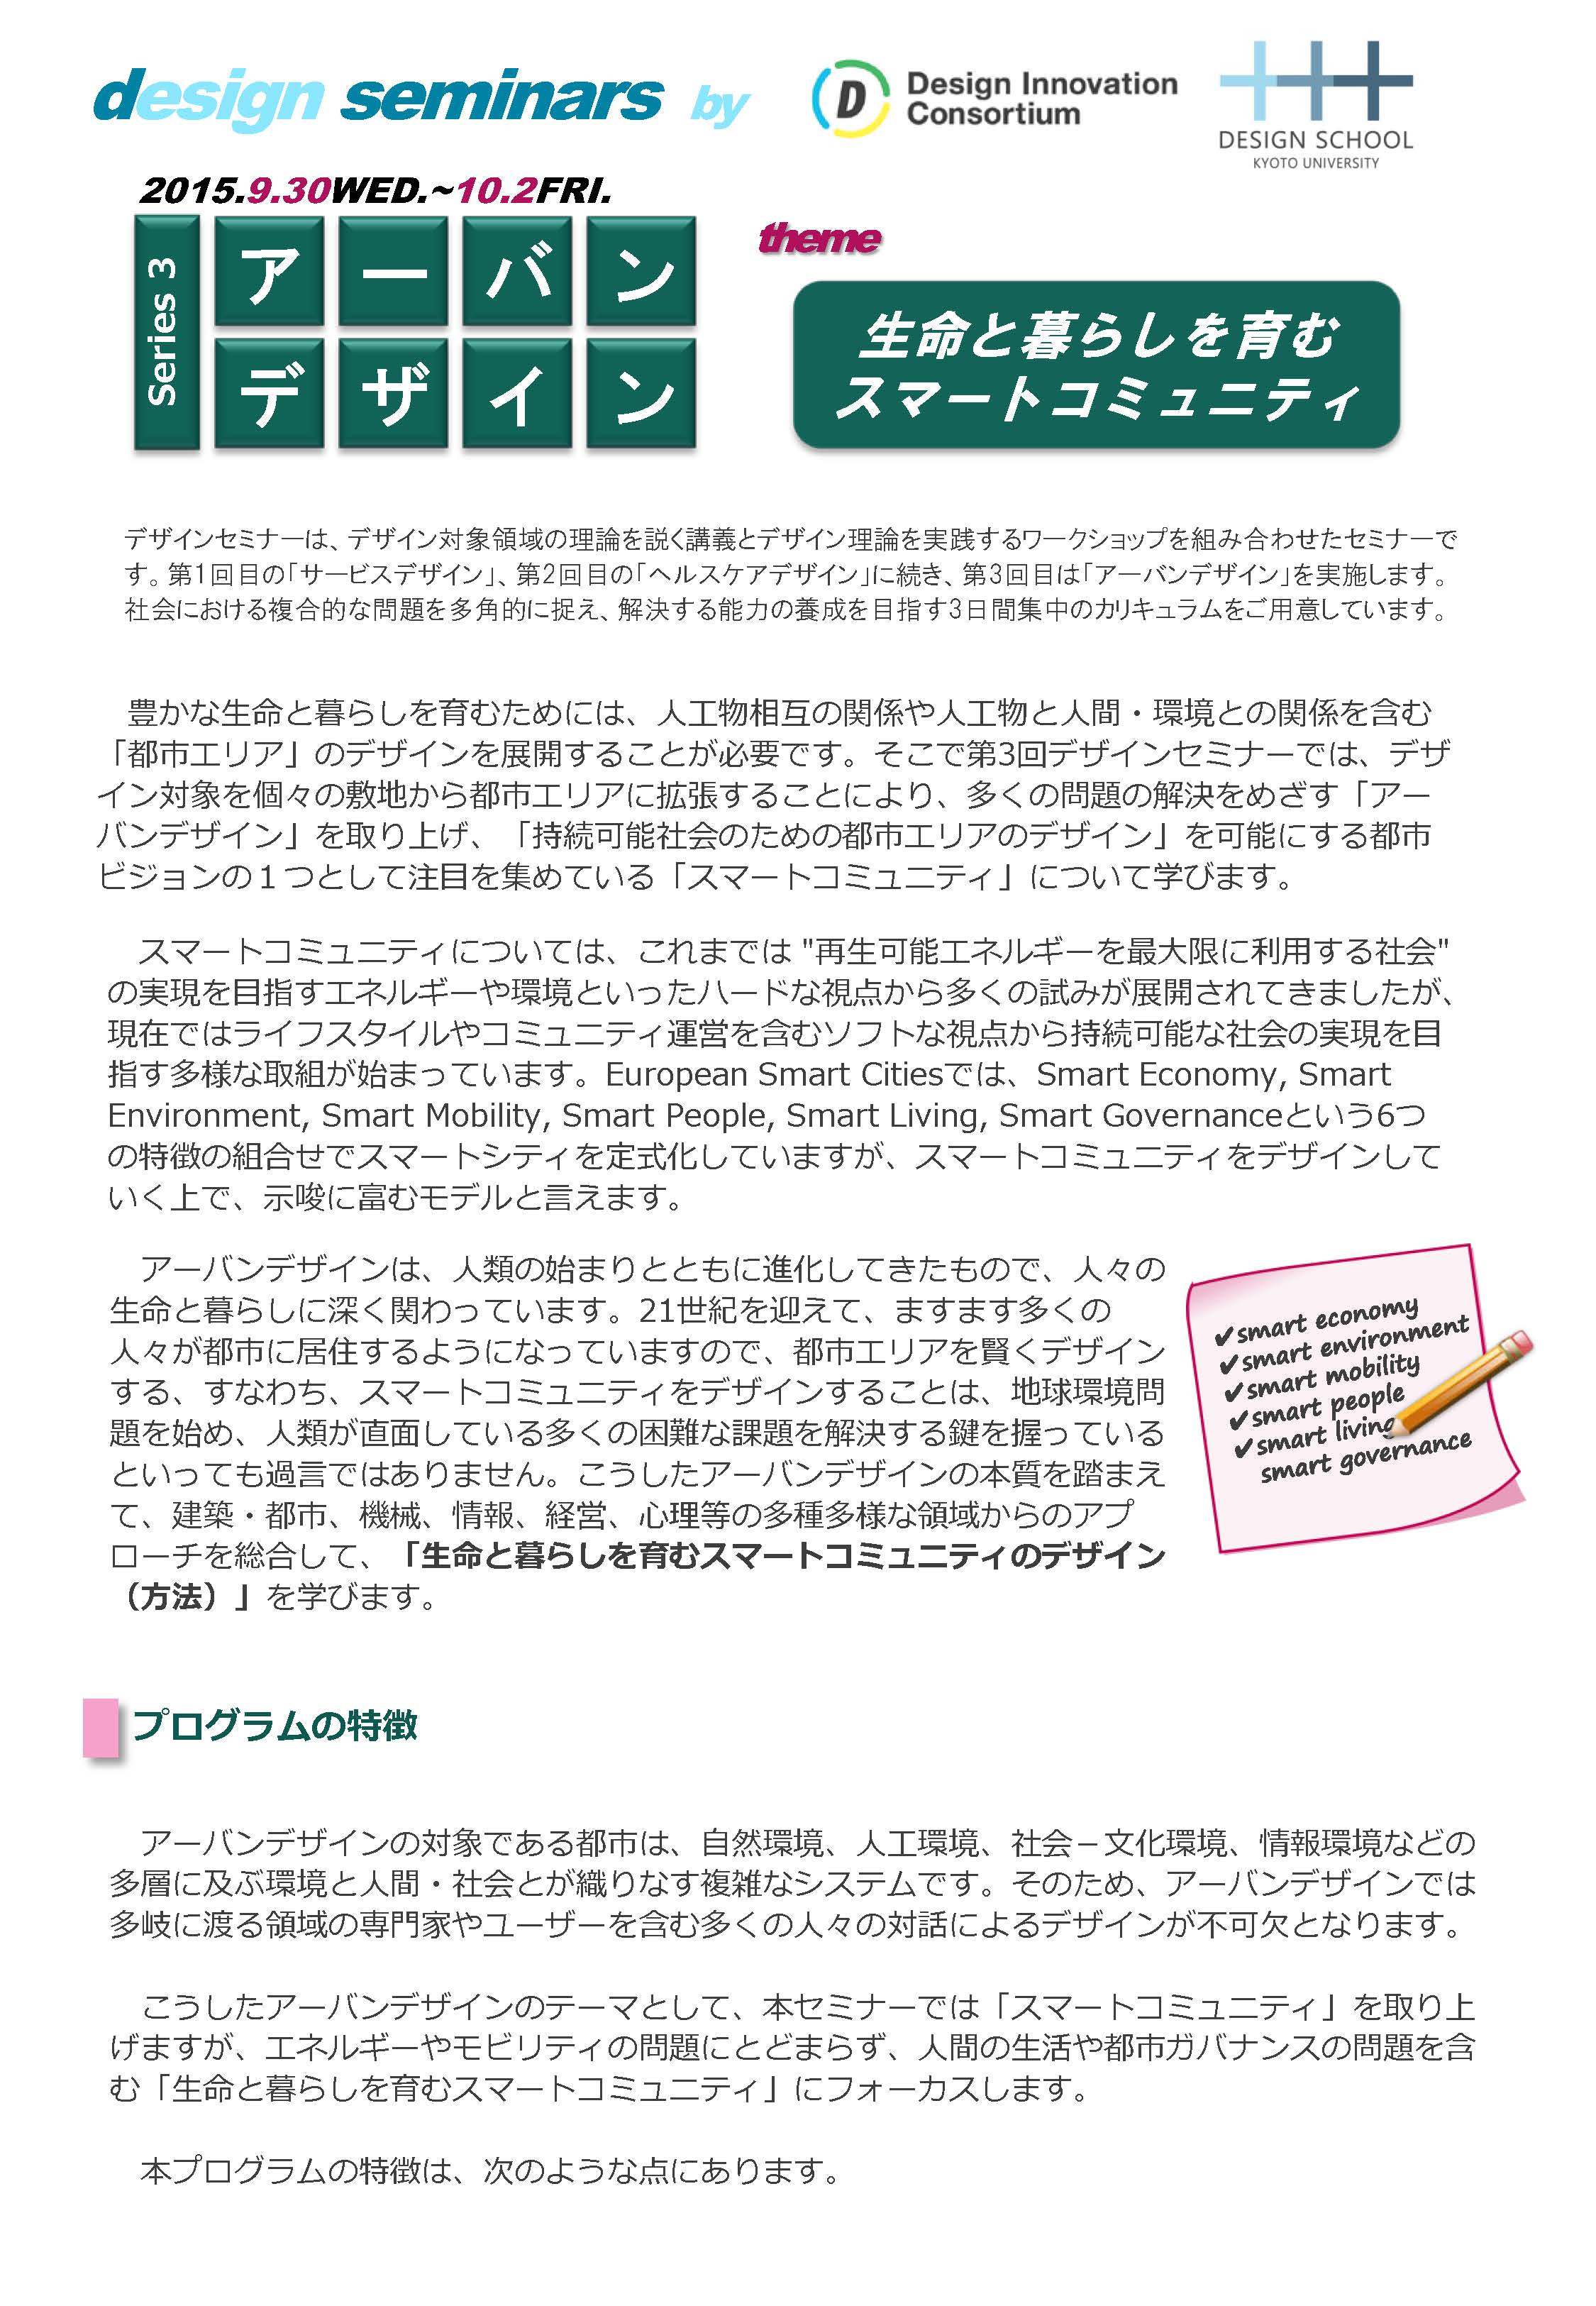 design_seminar3